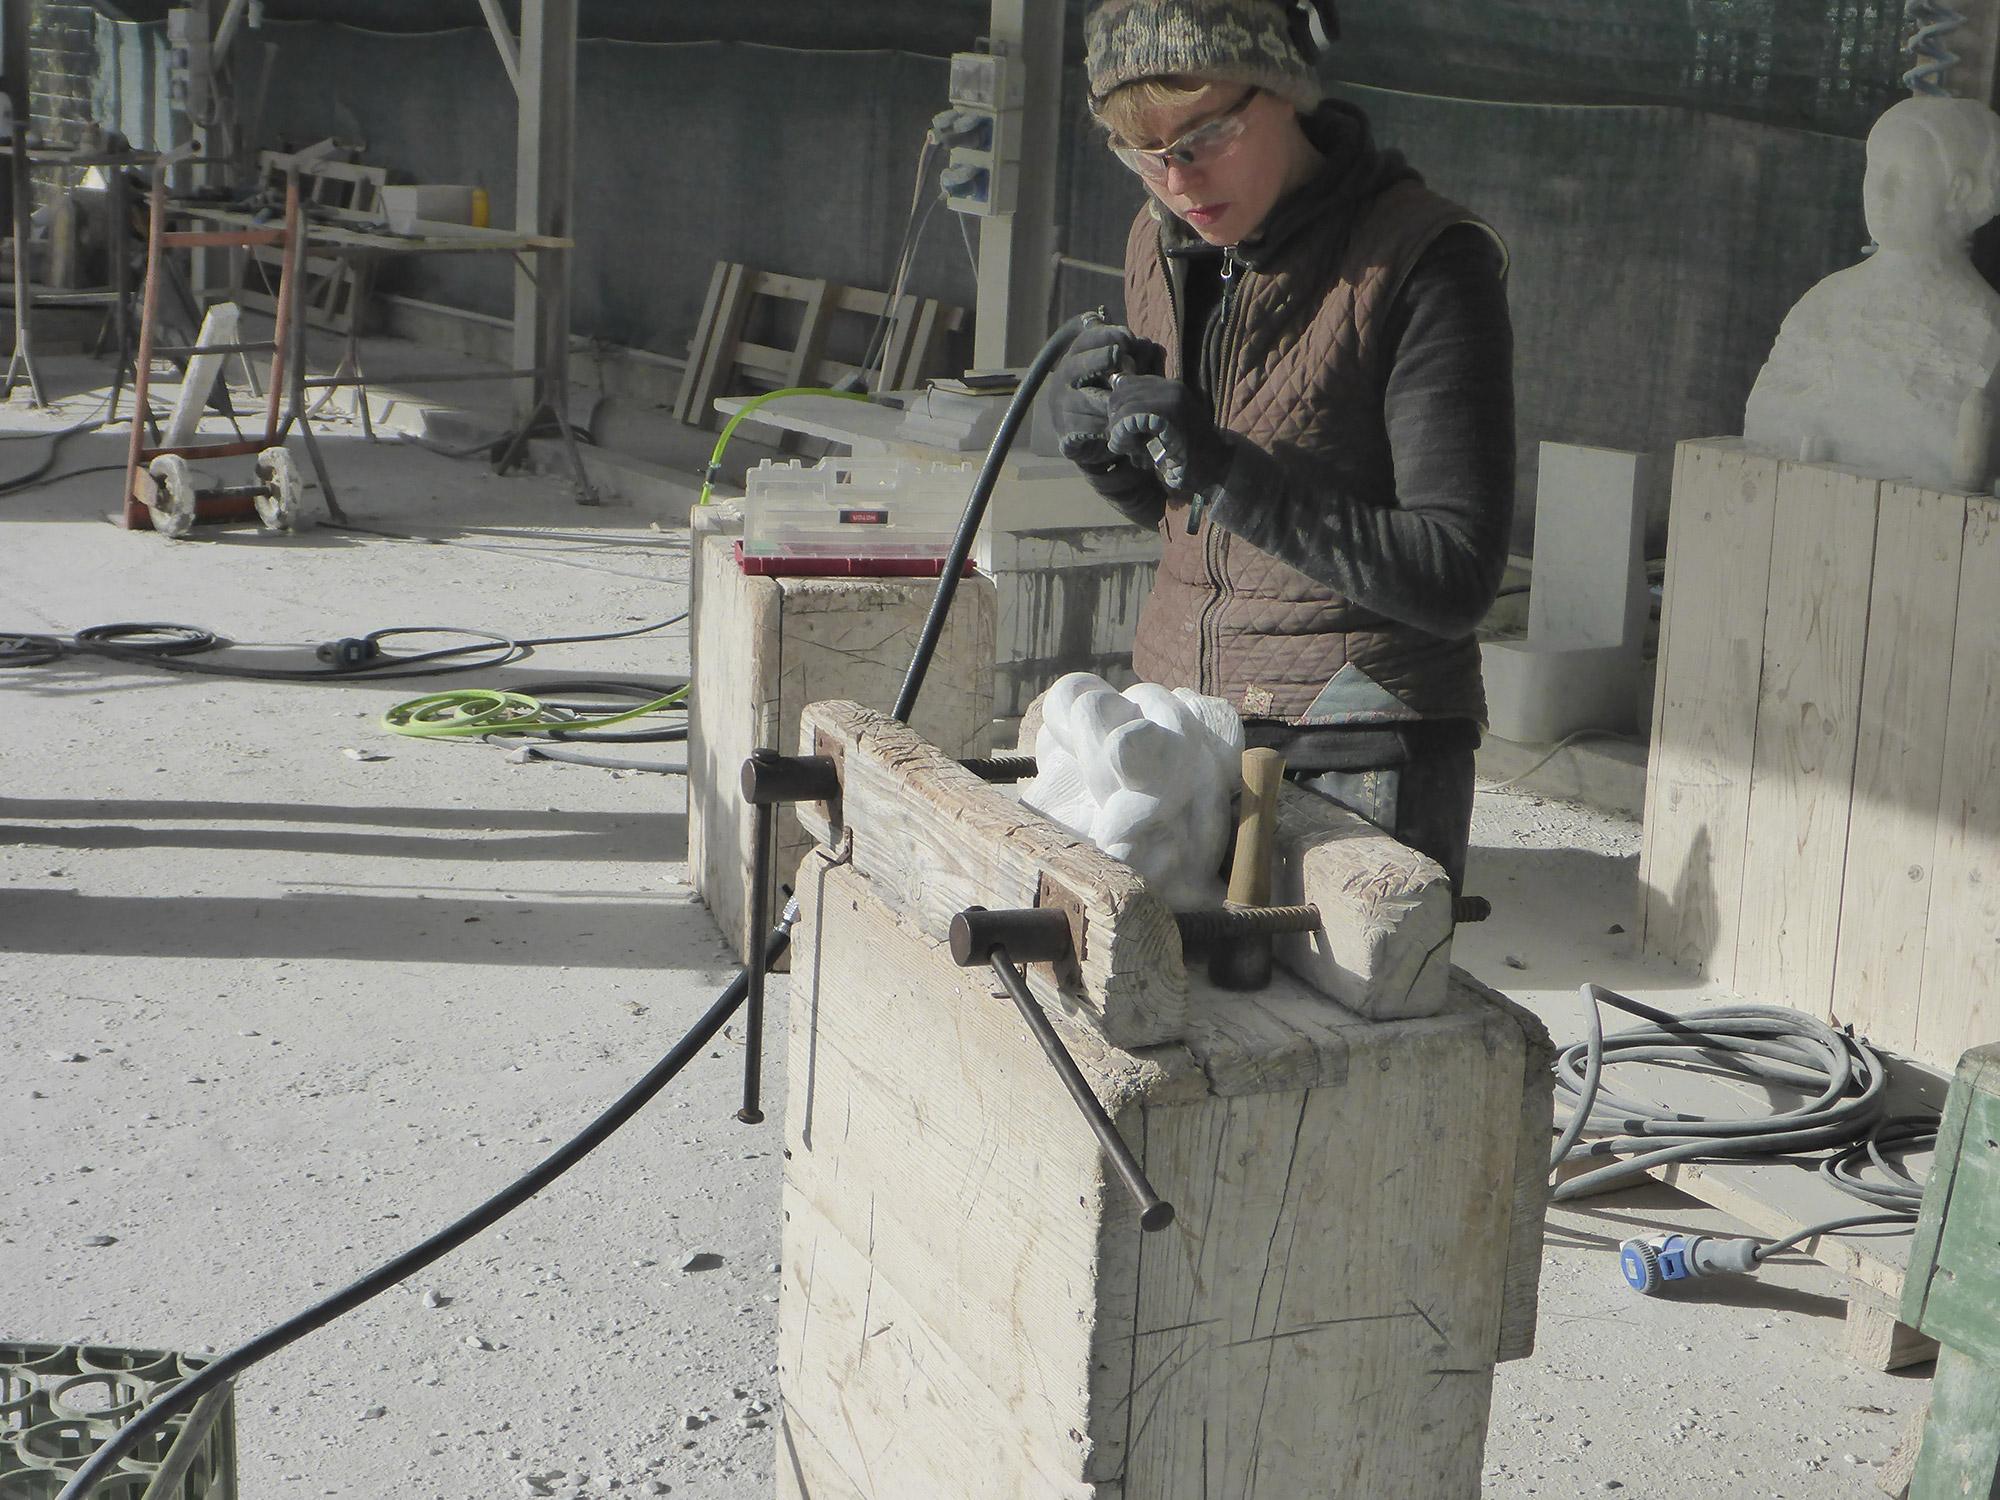 Mary-Beth-Gutkowski-Sculpture-Residency-Amelia-Kate-Sampson-and-Elizabeth-Hardy20171213_0210.jpg